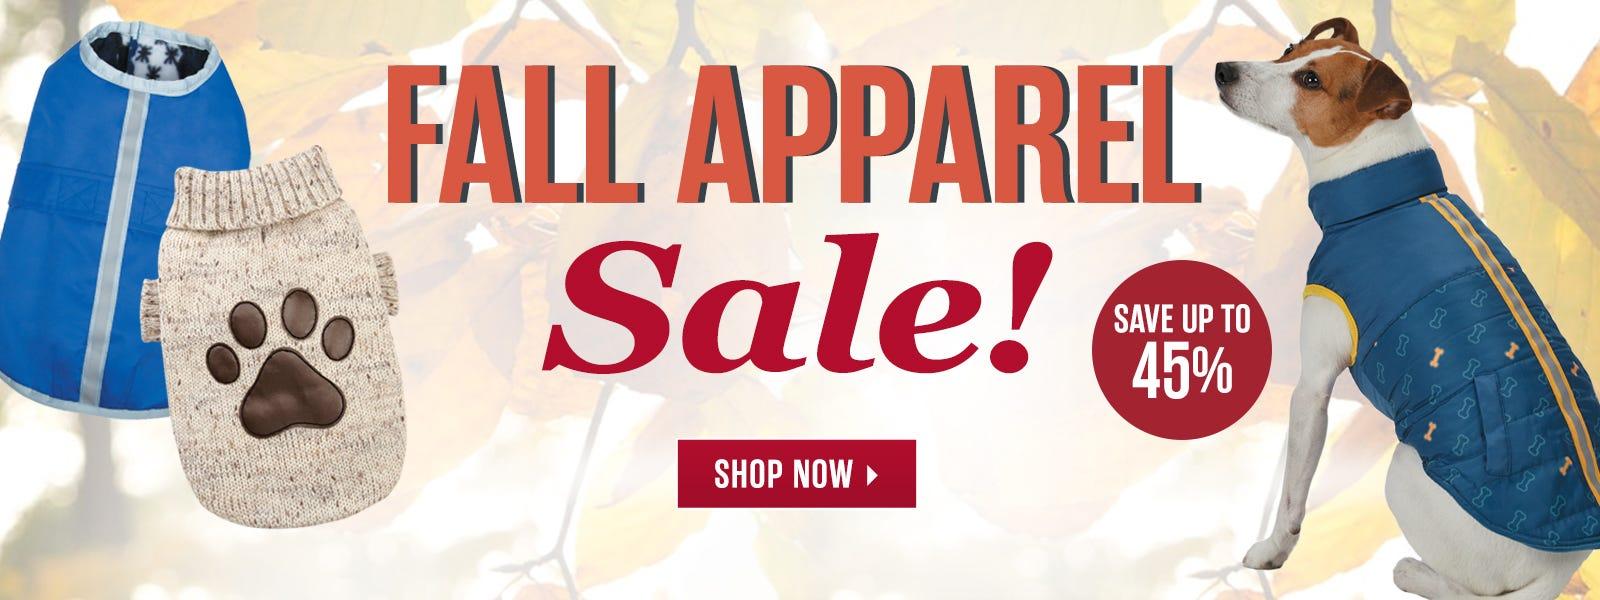 Wholesale Fall Apparel Sale